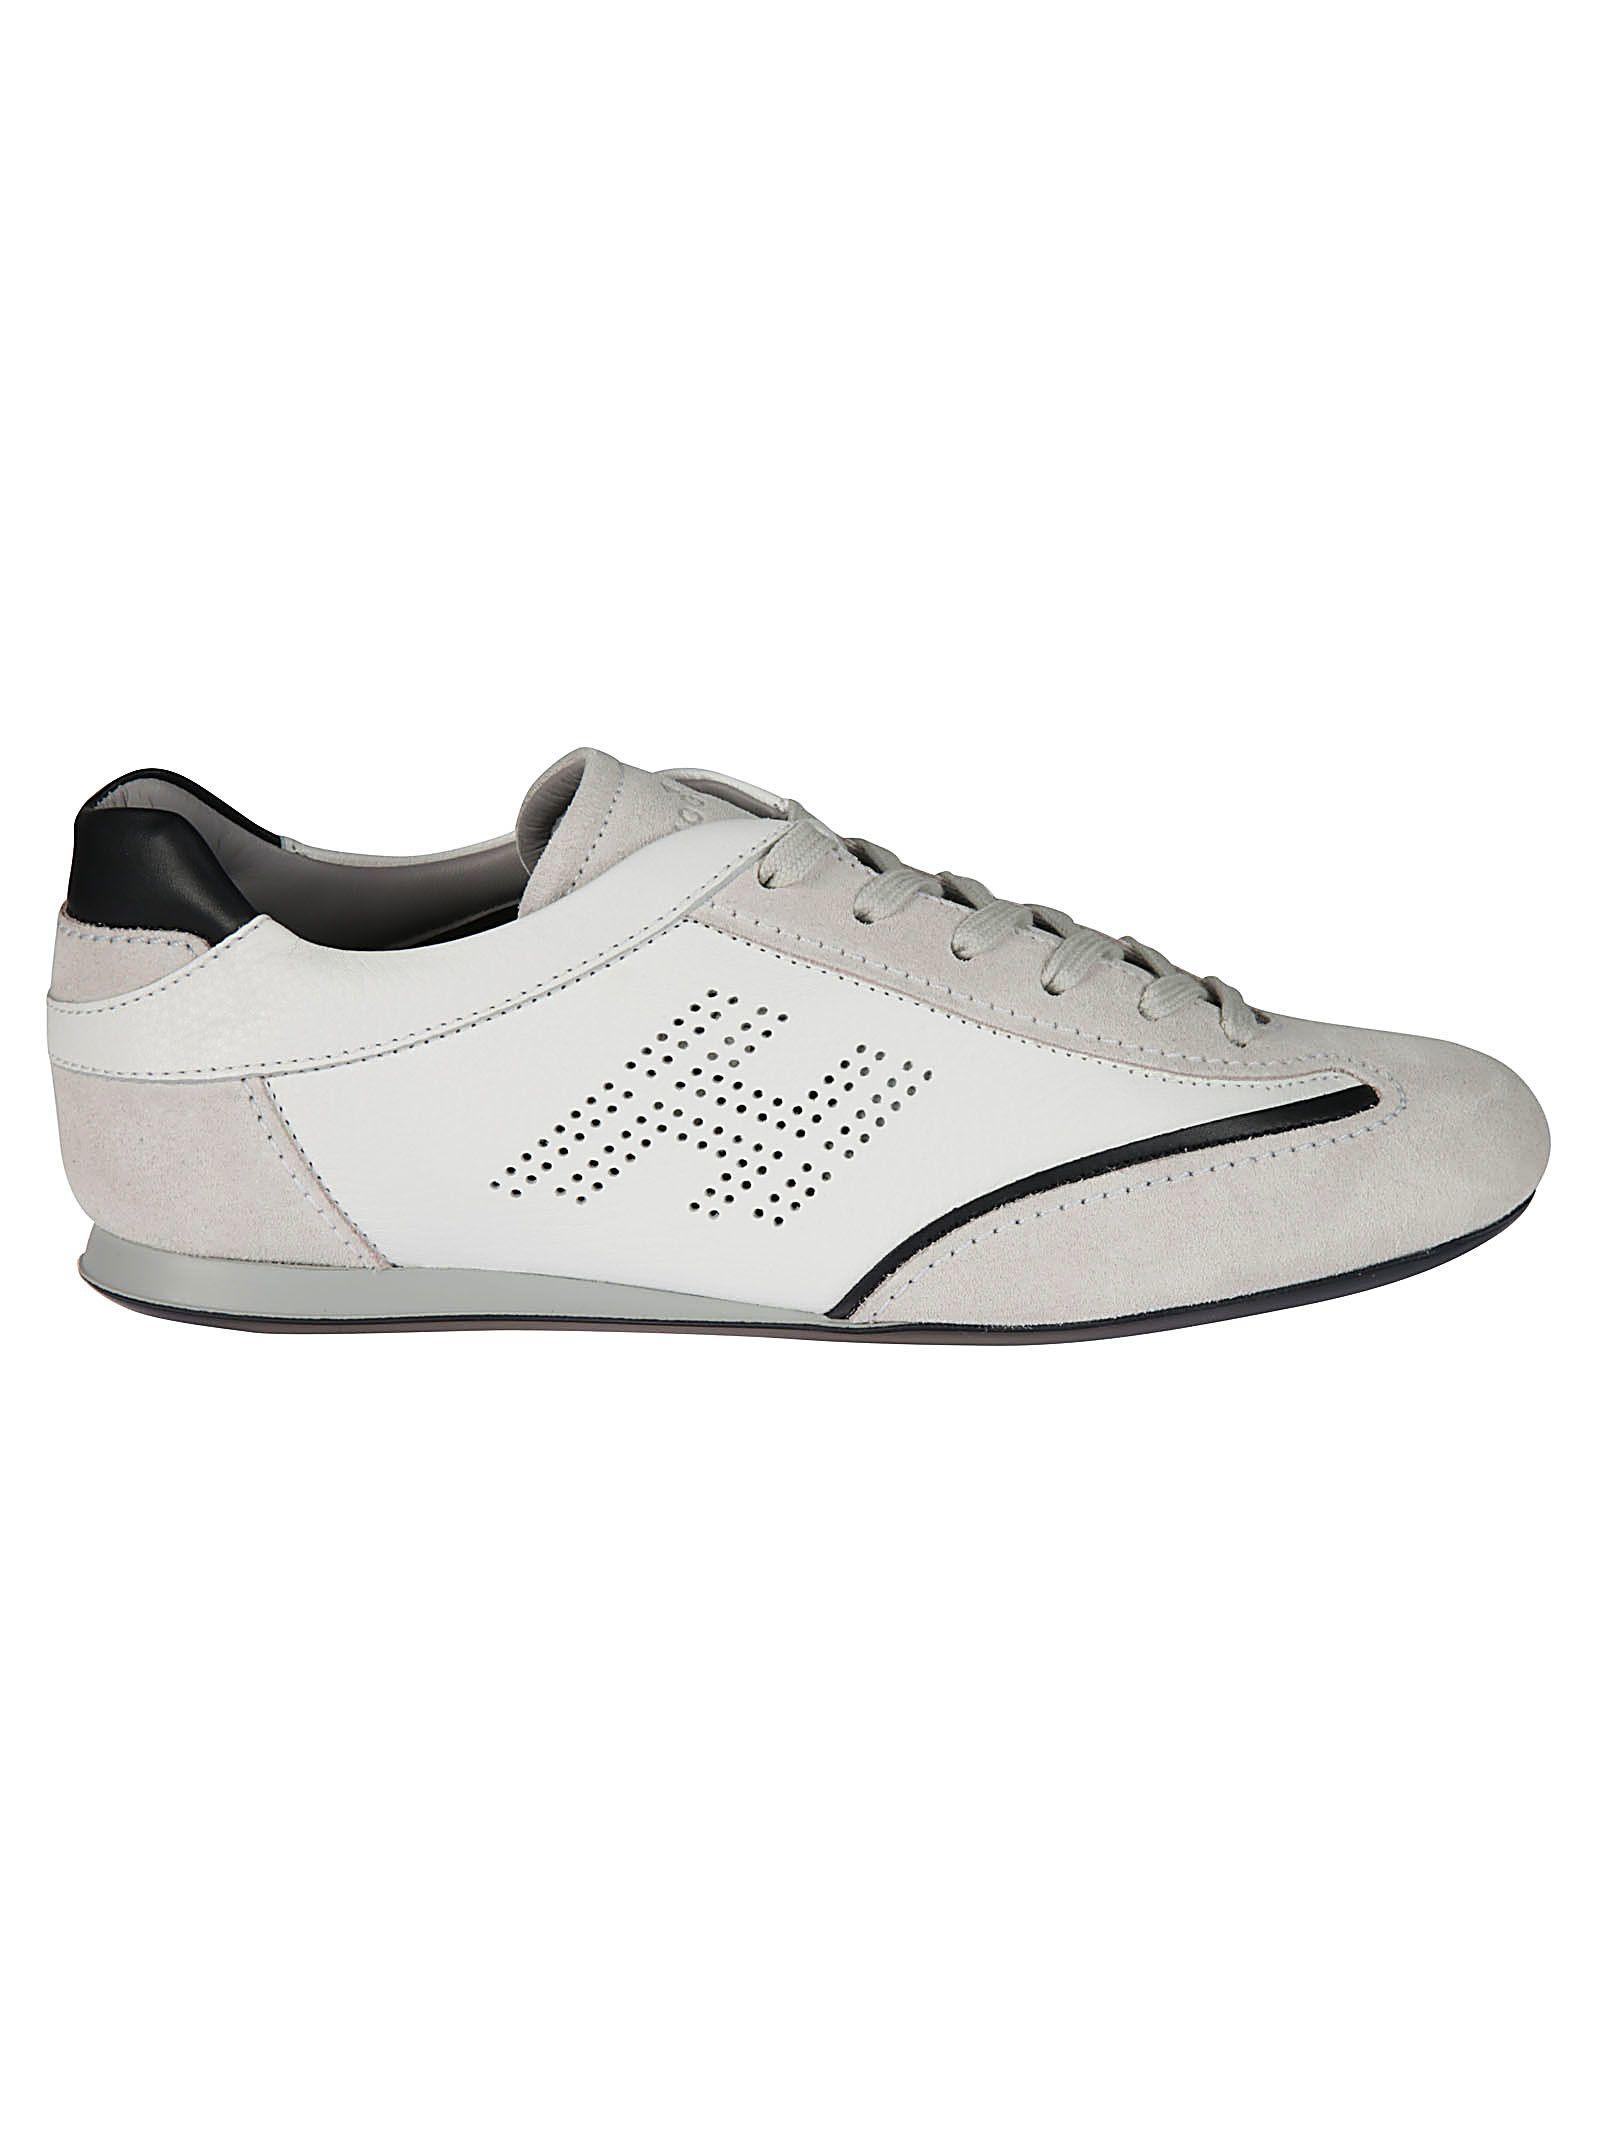 White Olympia Slash sneakers Hogan IwA5Xp6